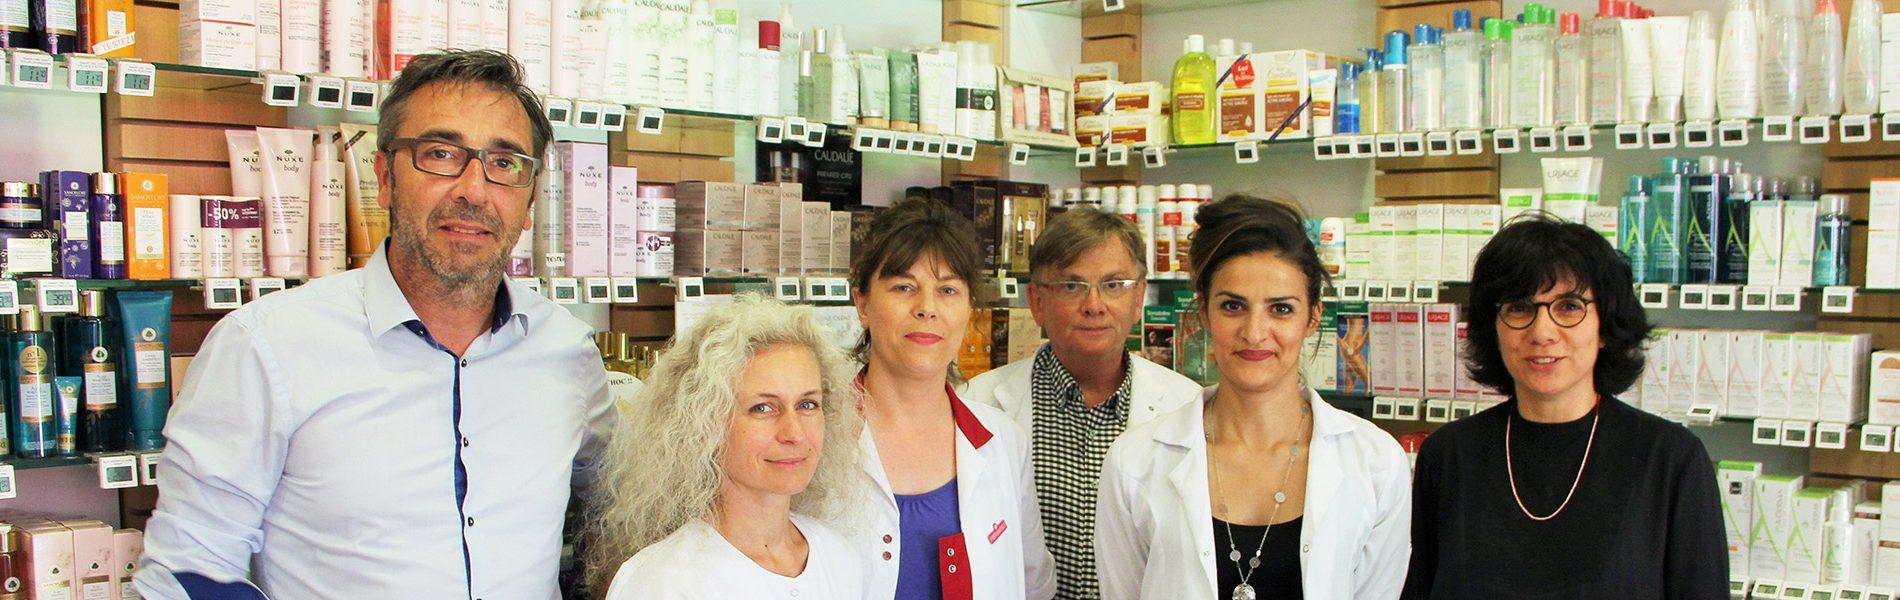 Pharmacie DE LA MAIRIE - Image Homepage 4